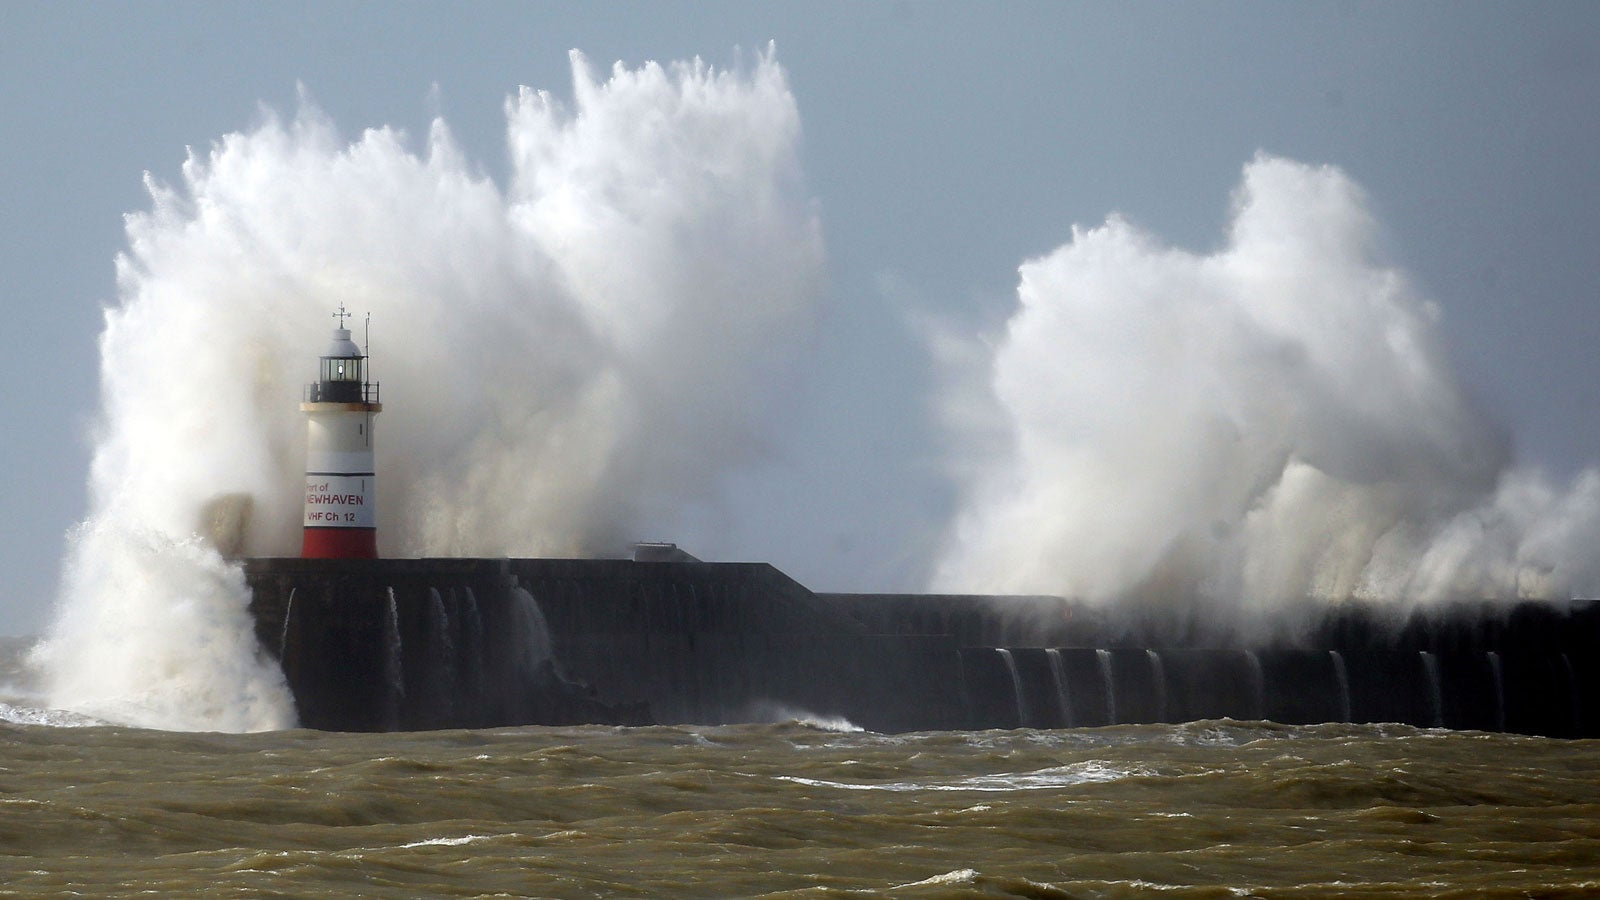 Sturm England Heute